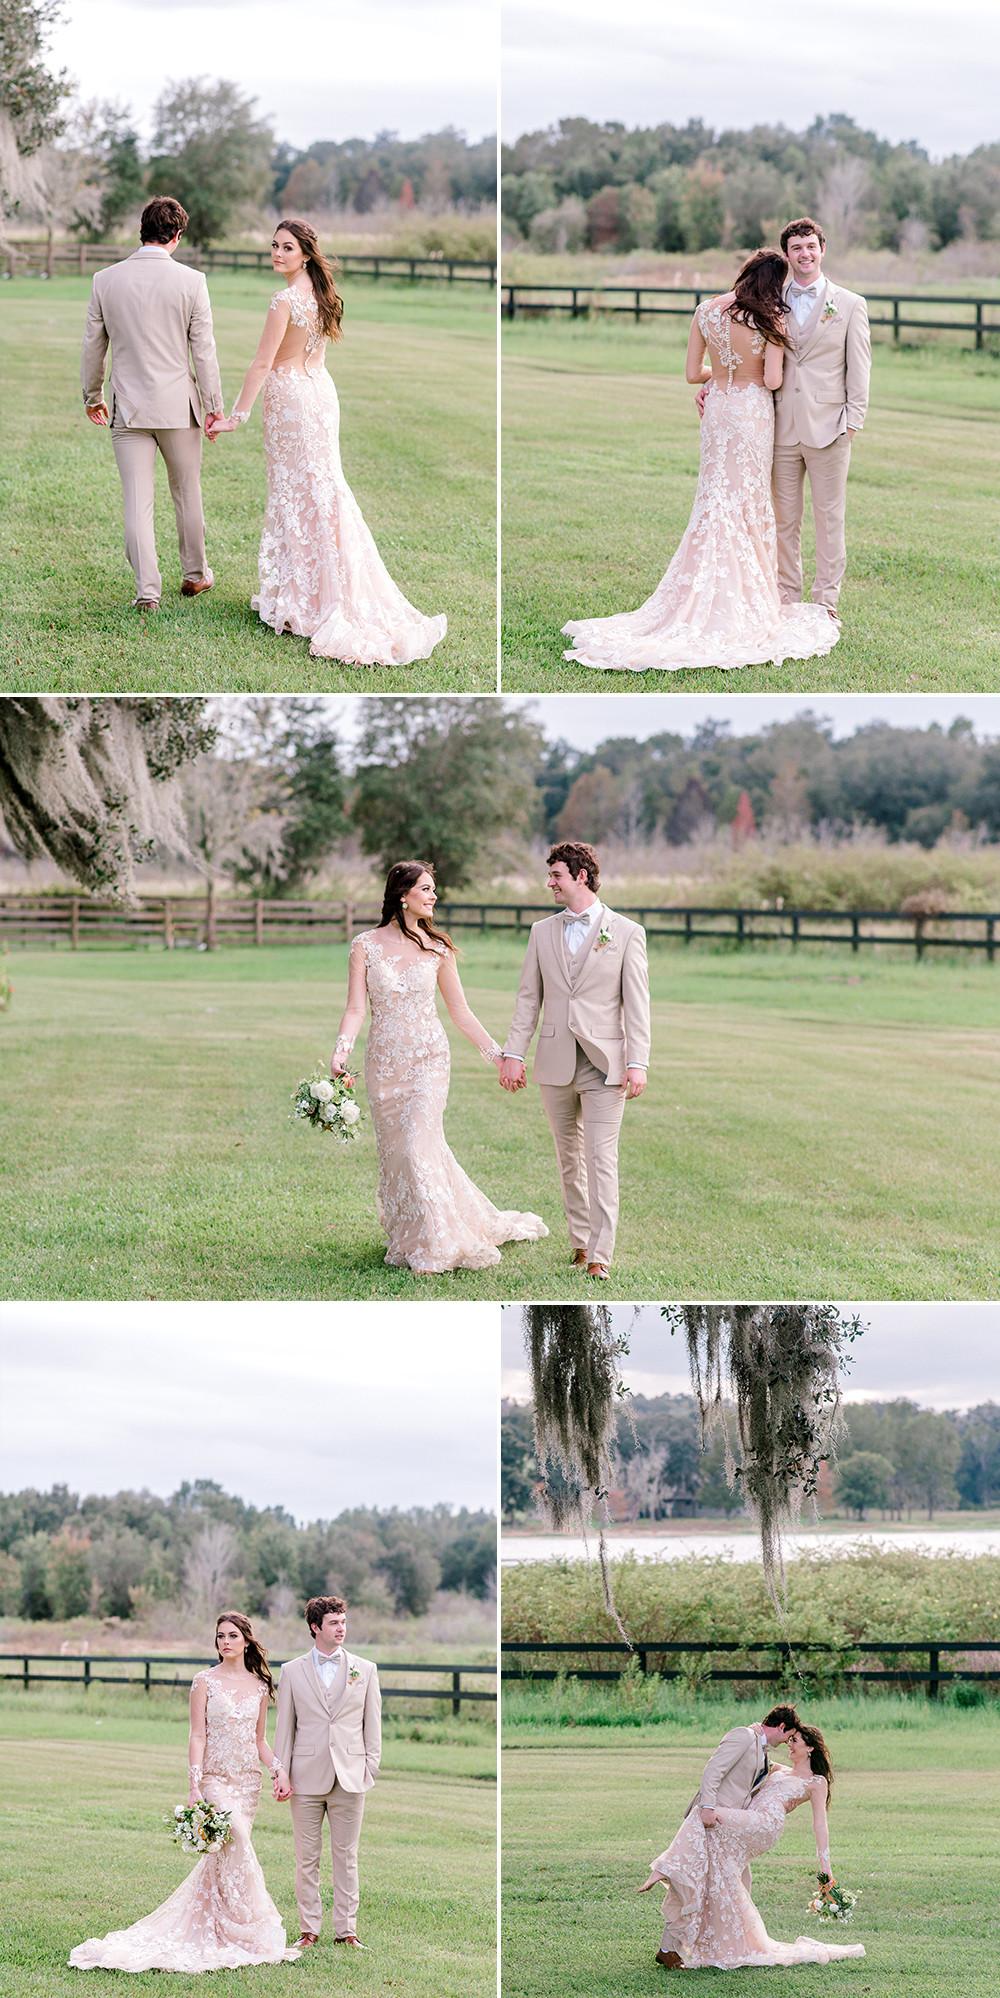 Tampa wedding photographer Nina Bashaw shares photos from a wedding at Covington Farms in Dade City, FL